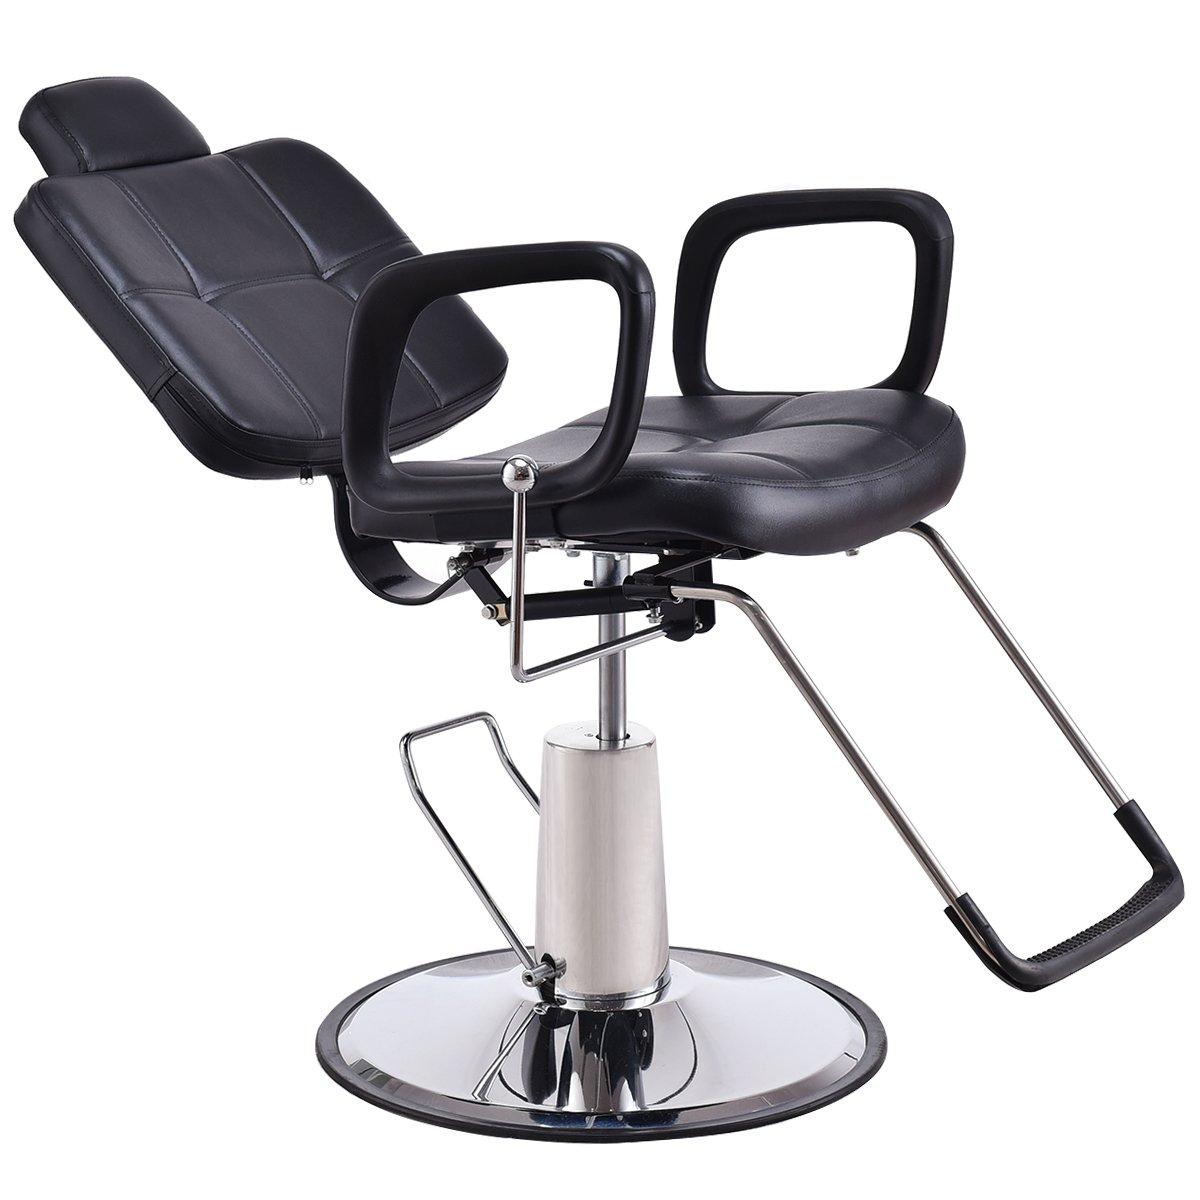 Miraculous Giantex Barber Chair Reclining Spa Spa Adjustable Hydraulic Pu Leather Cushioned Seat Comfortable Creativecarmelina Interior Chair Design Creativecarmelinacom